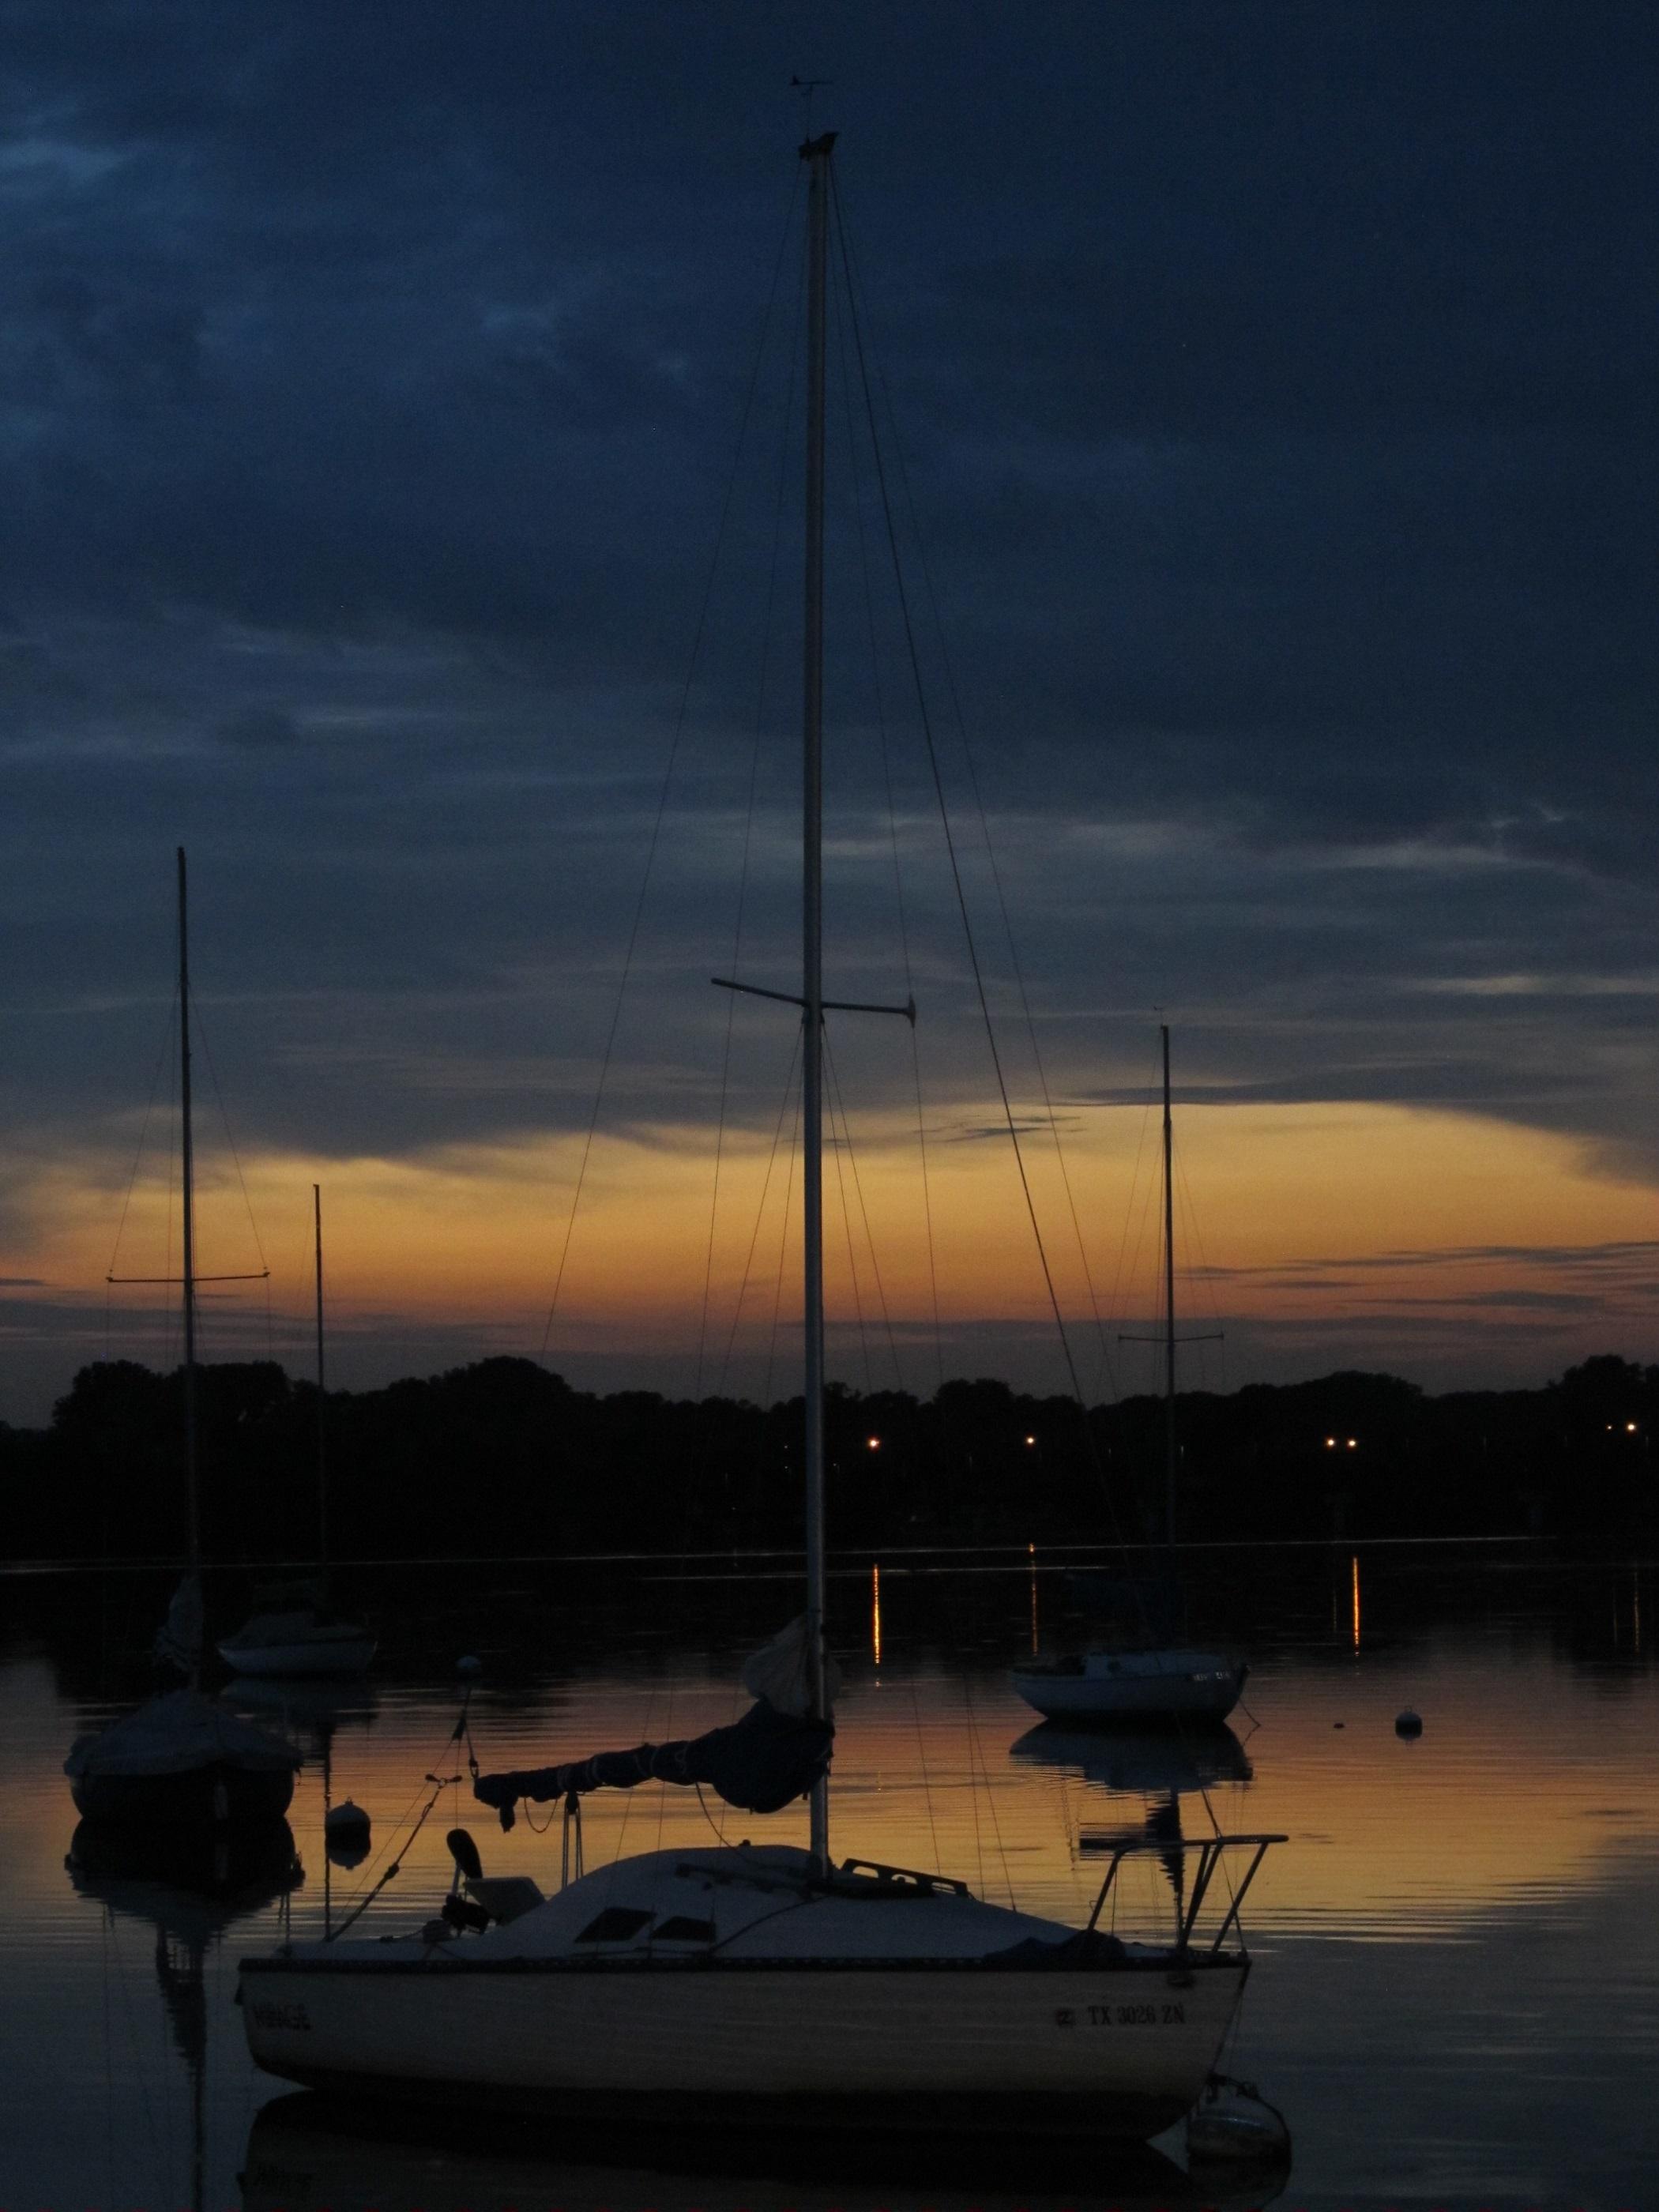 Night Life, Boats, Last, Nature, Night, HQ Photo